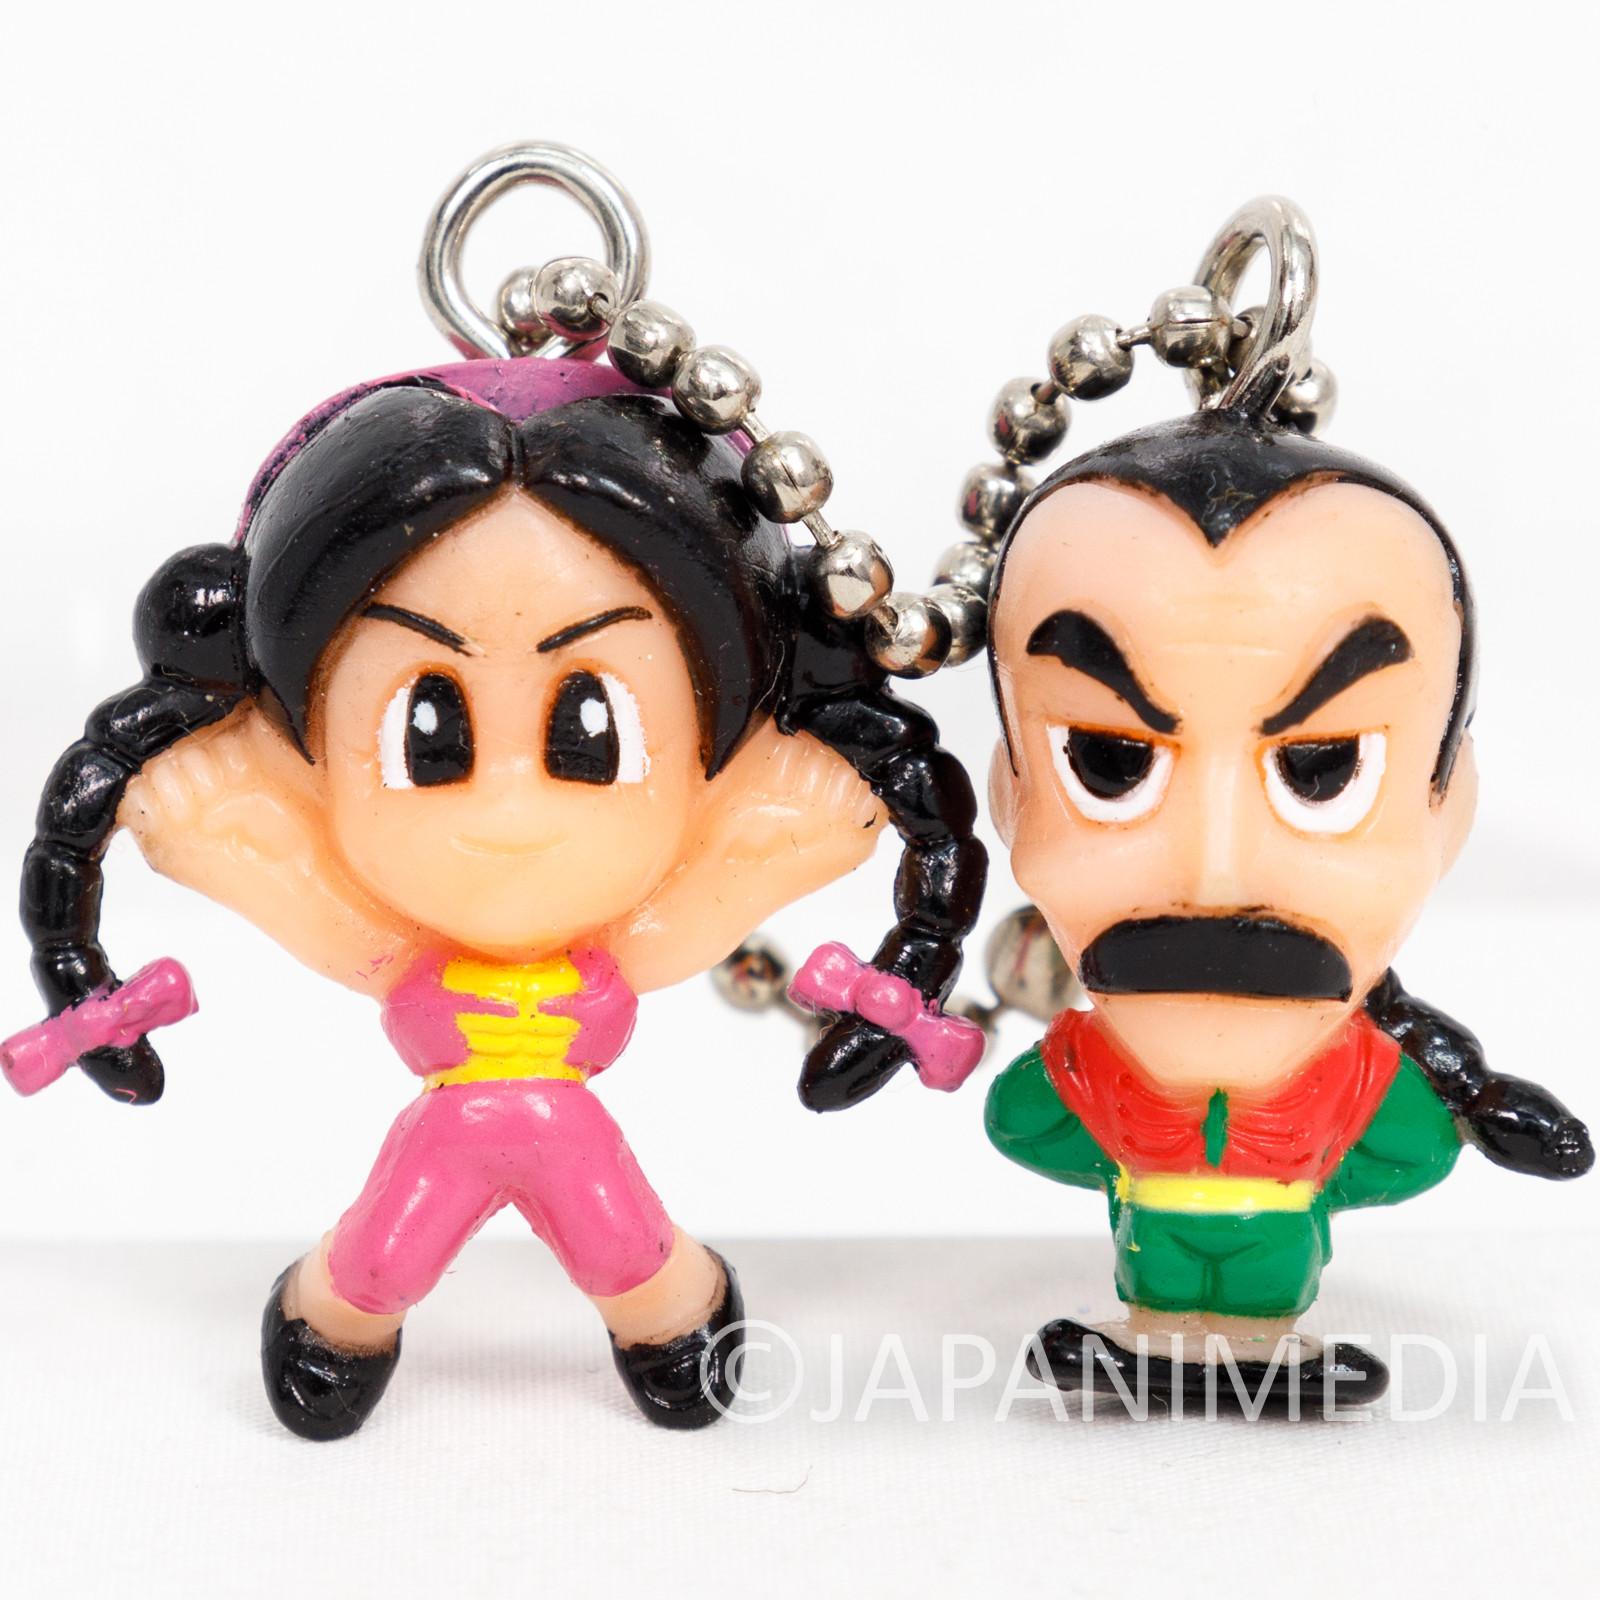 Virtua Fighter Lau & Pai Macot Figure Ballchain JAPAN ANIME